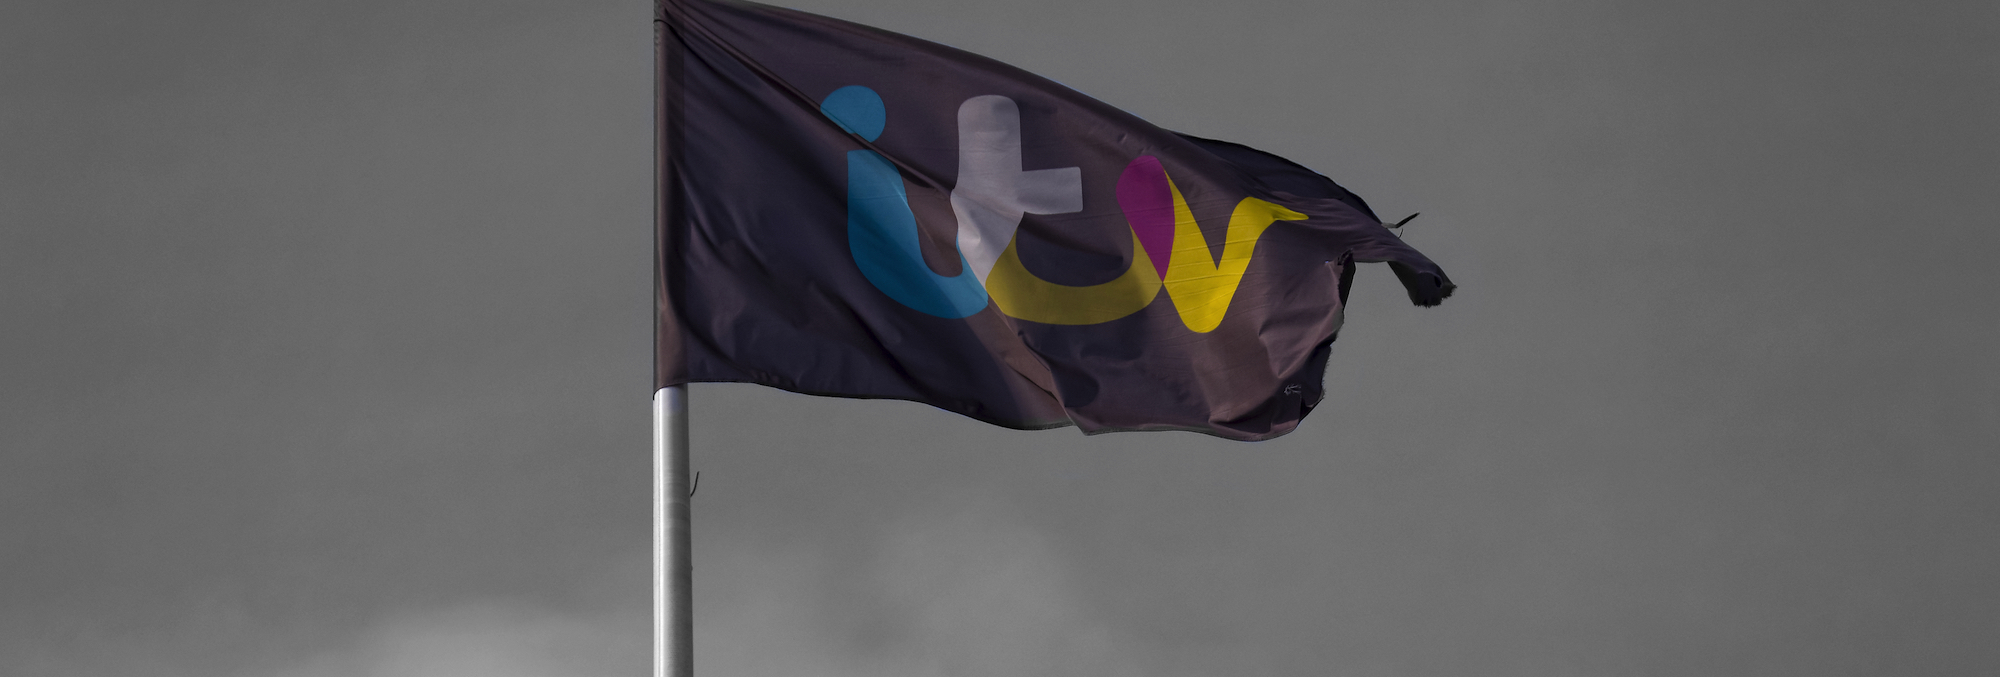 ITV image